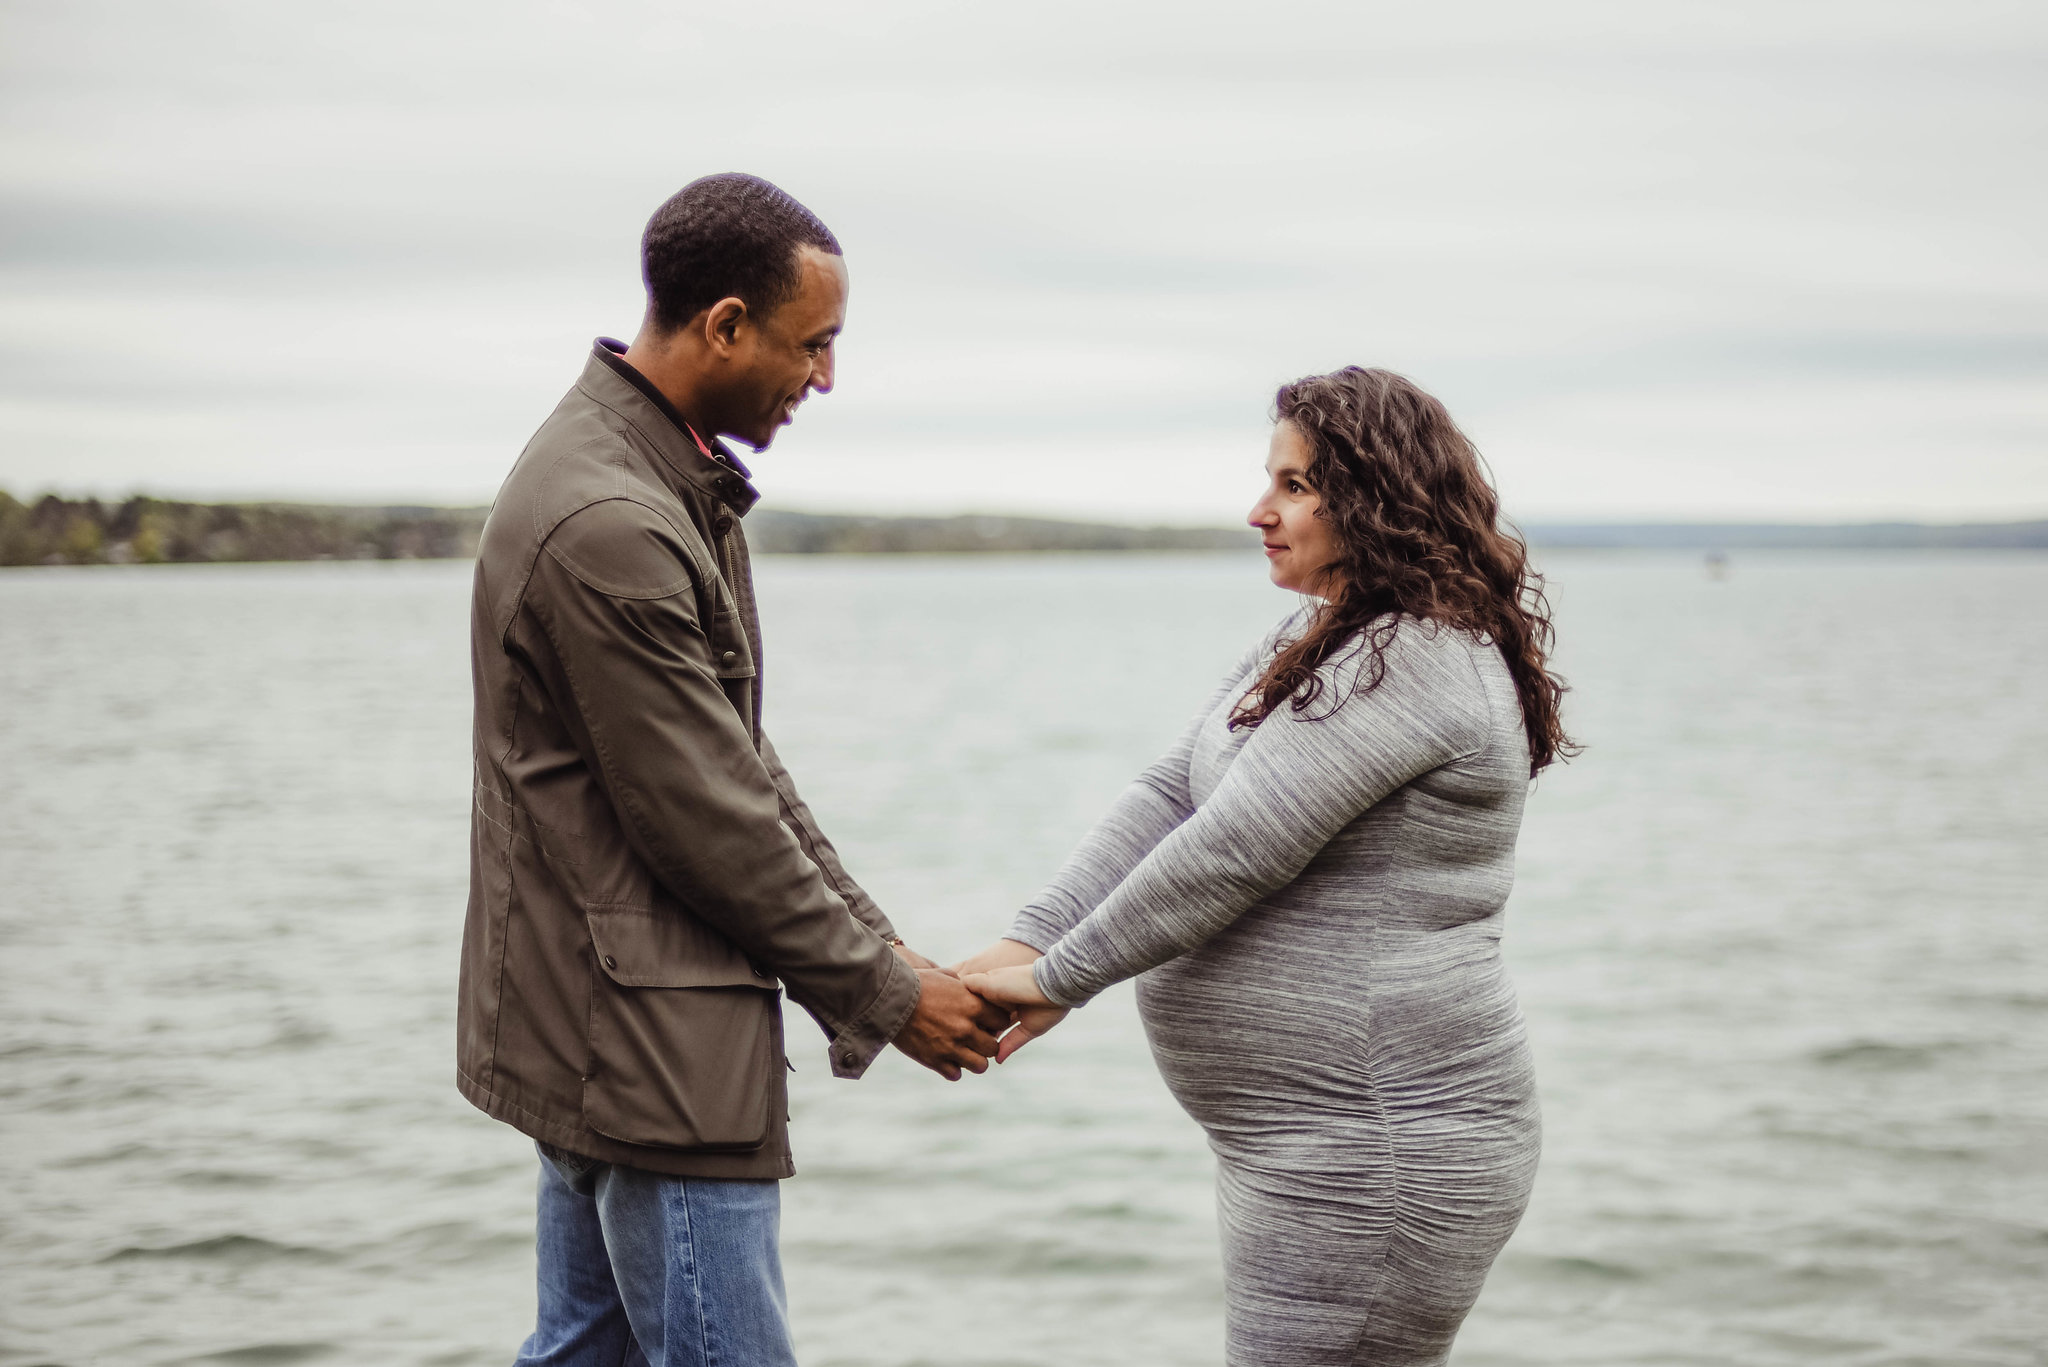 Outdoor Skaneateles lake lakeside maternity photoshoot photography session